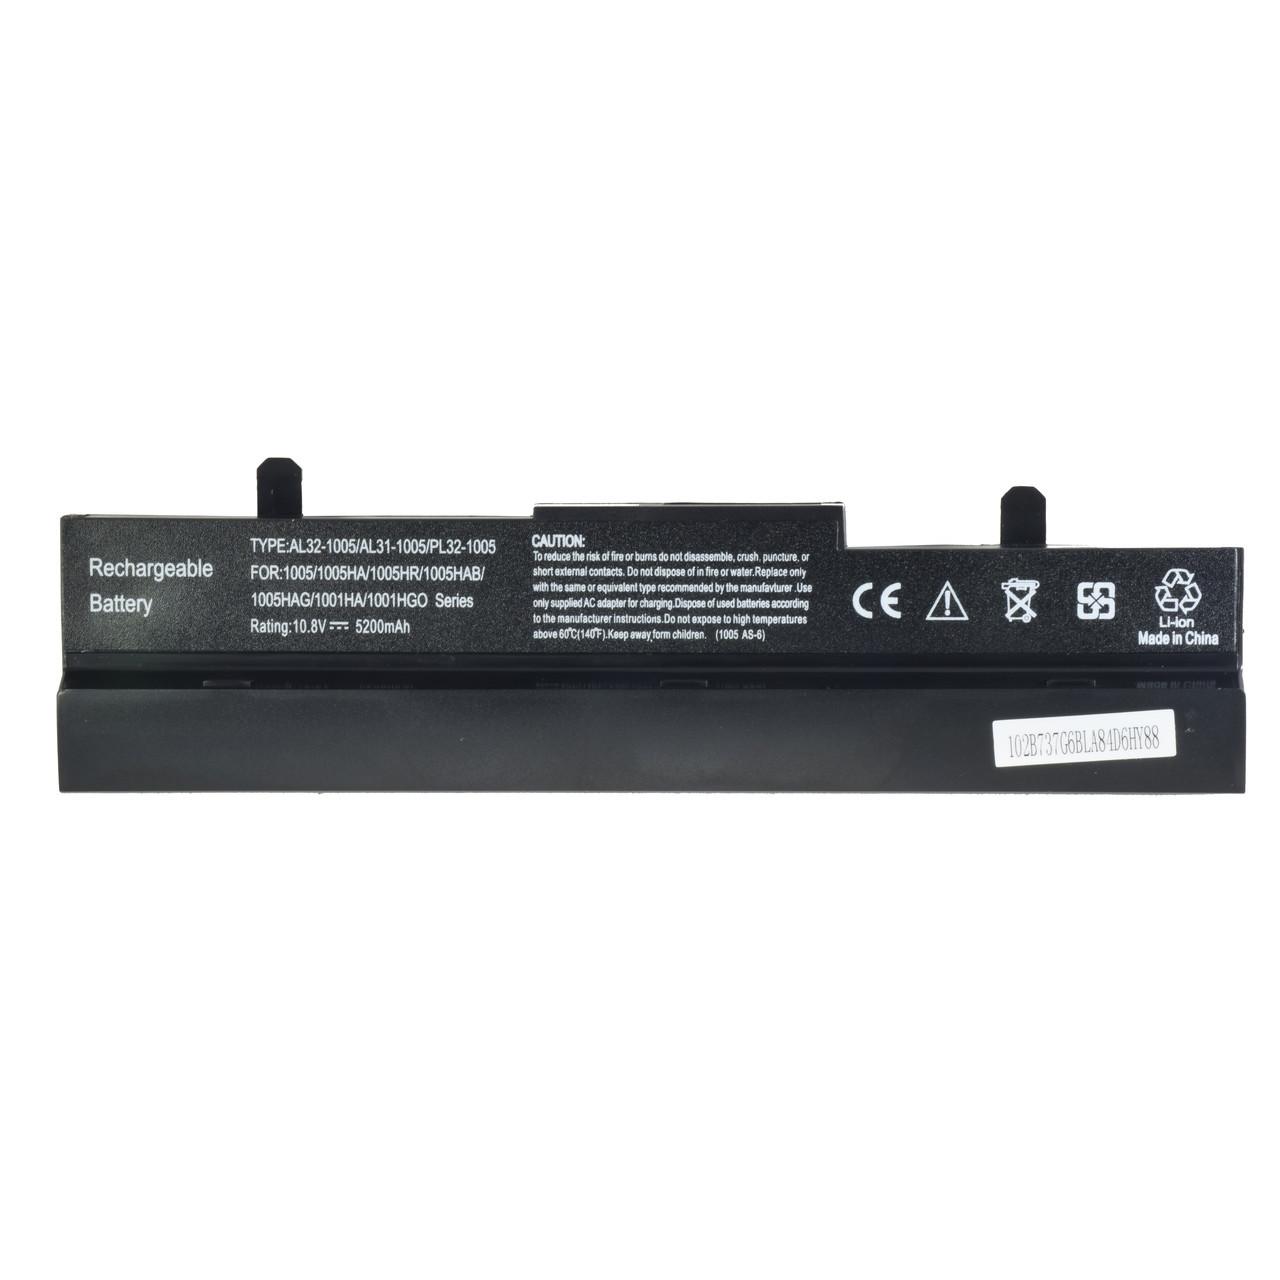 Батарея для ноутбука ASUS Eee PC  AL31-1005 AL32-1005 ML32-1005 PL32-1005